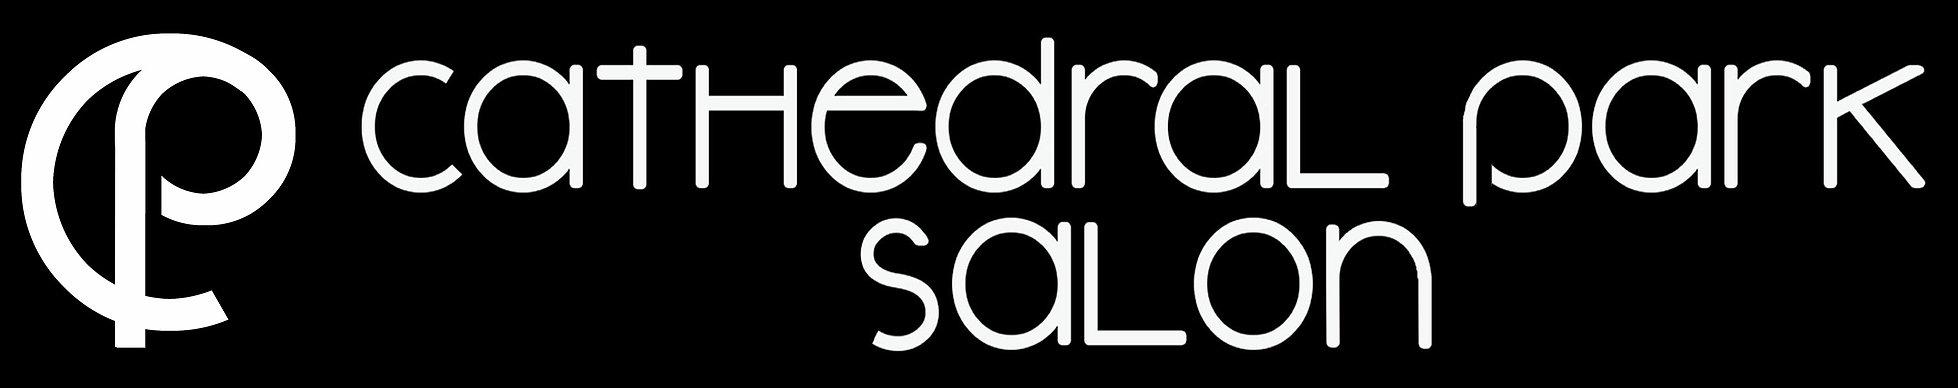 Cathedral Park Salon Logo